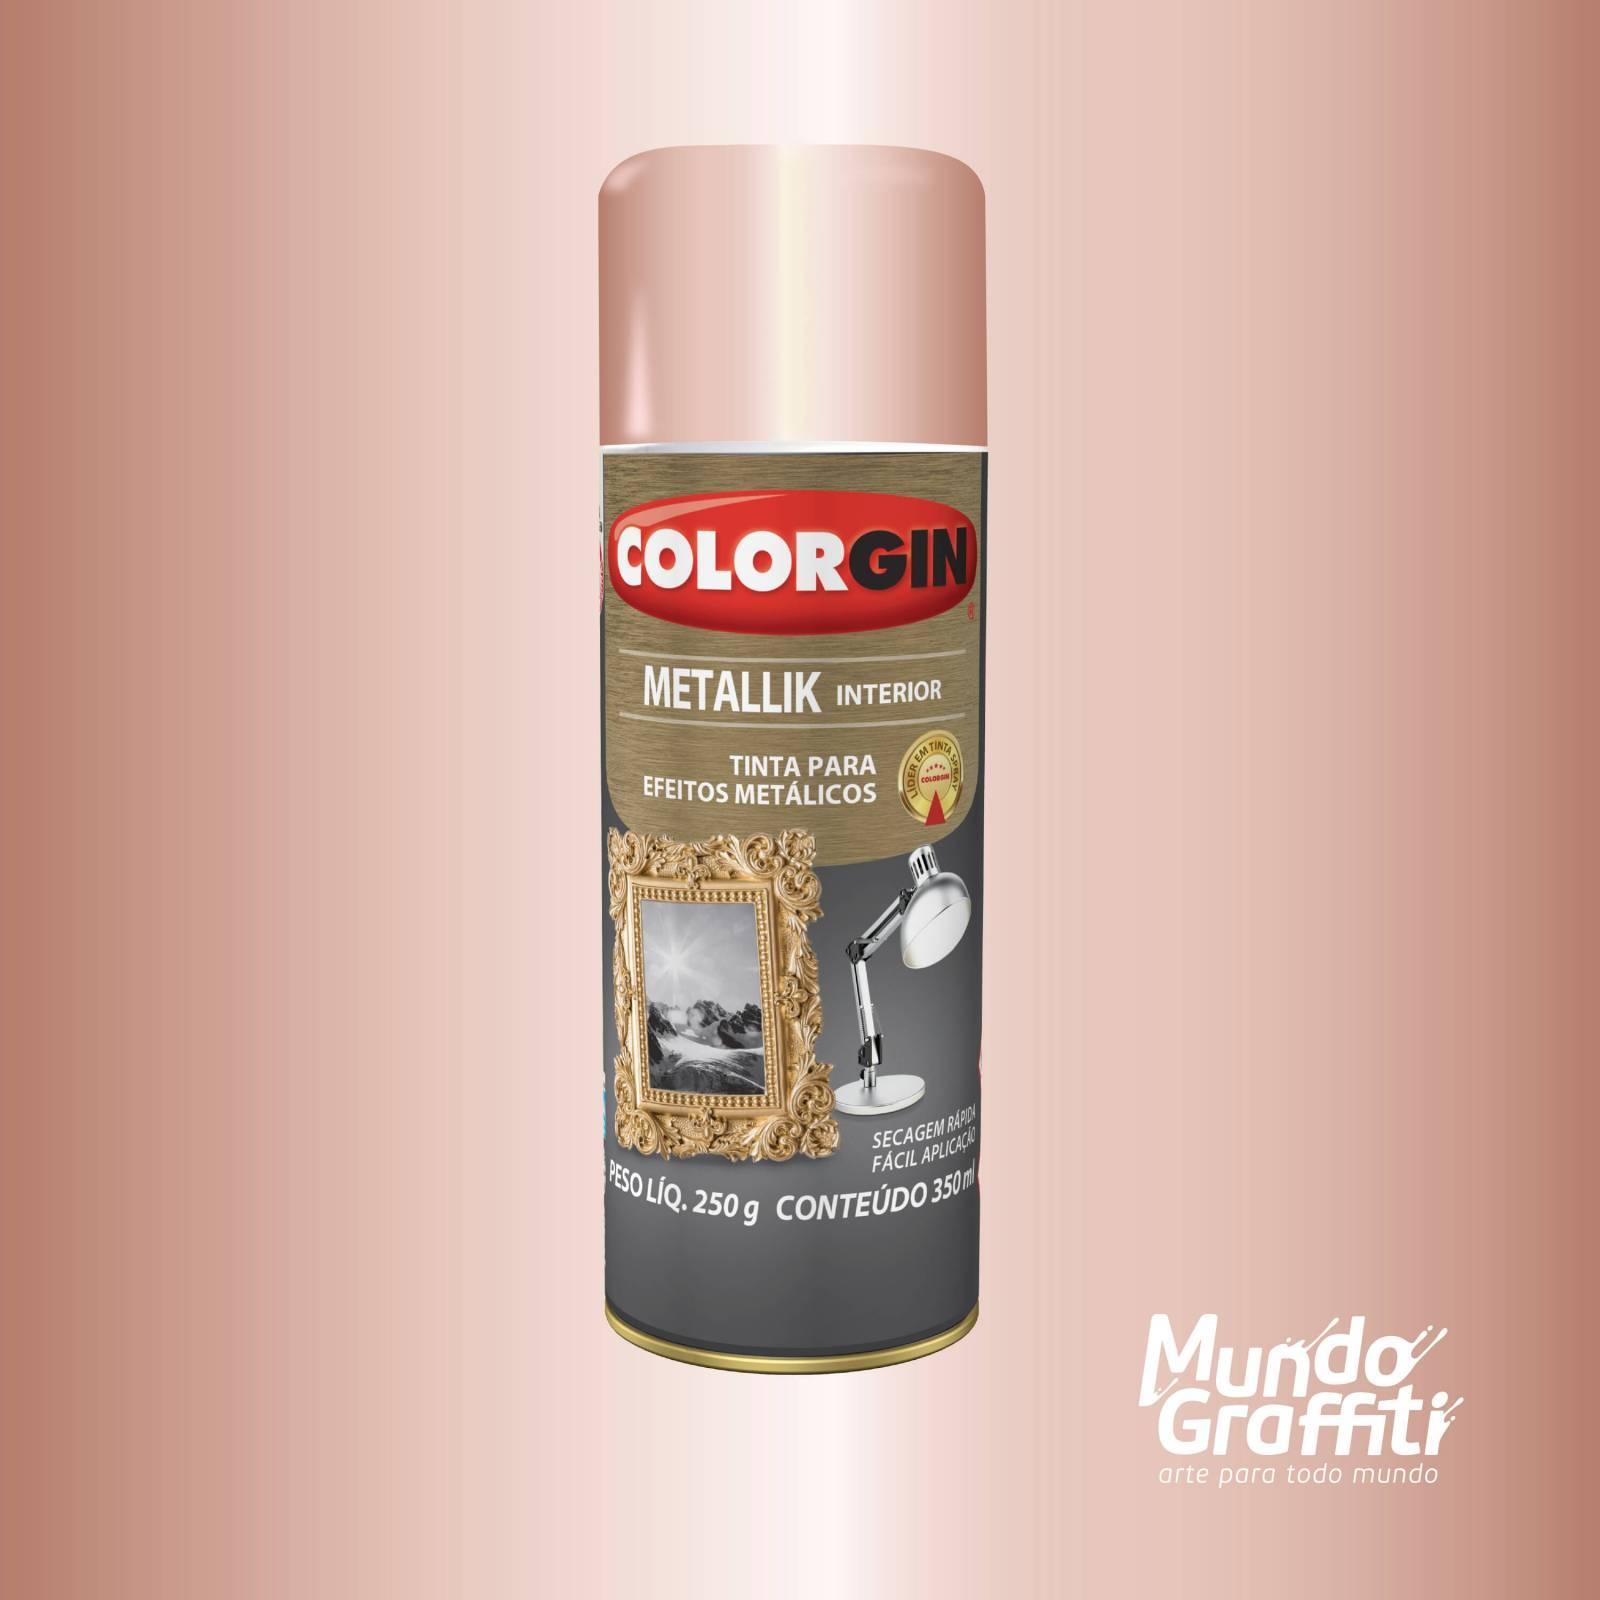 Tinta Spray Colorgin Metallik 056 Rose Gold 350ml - Mundo Graffiti